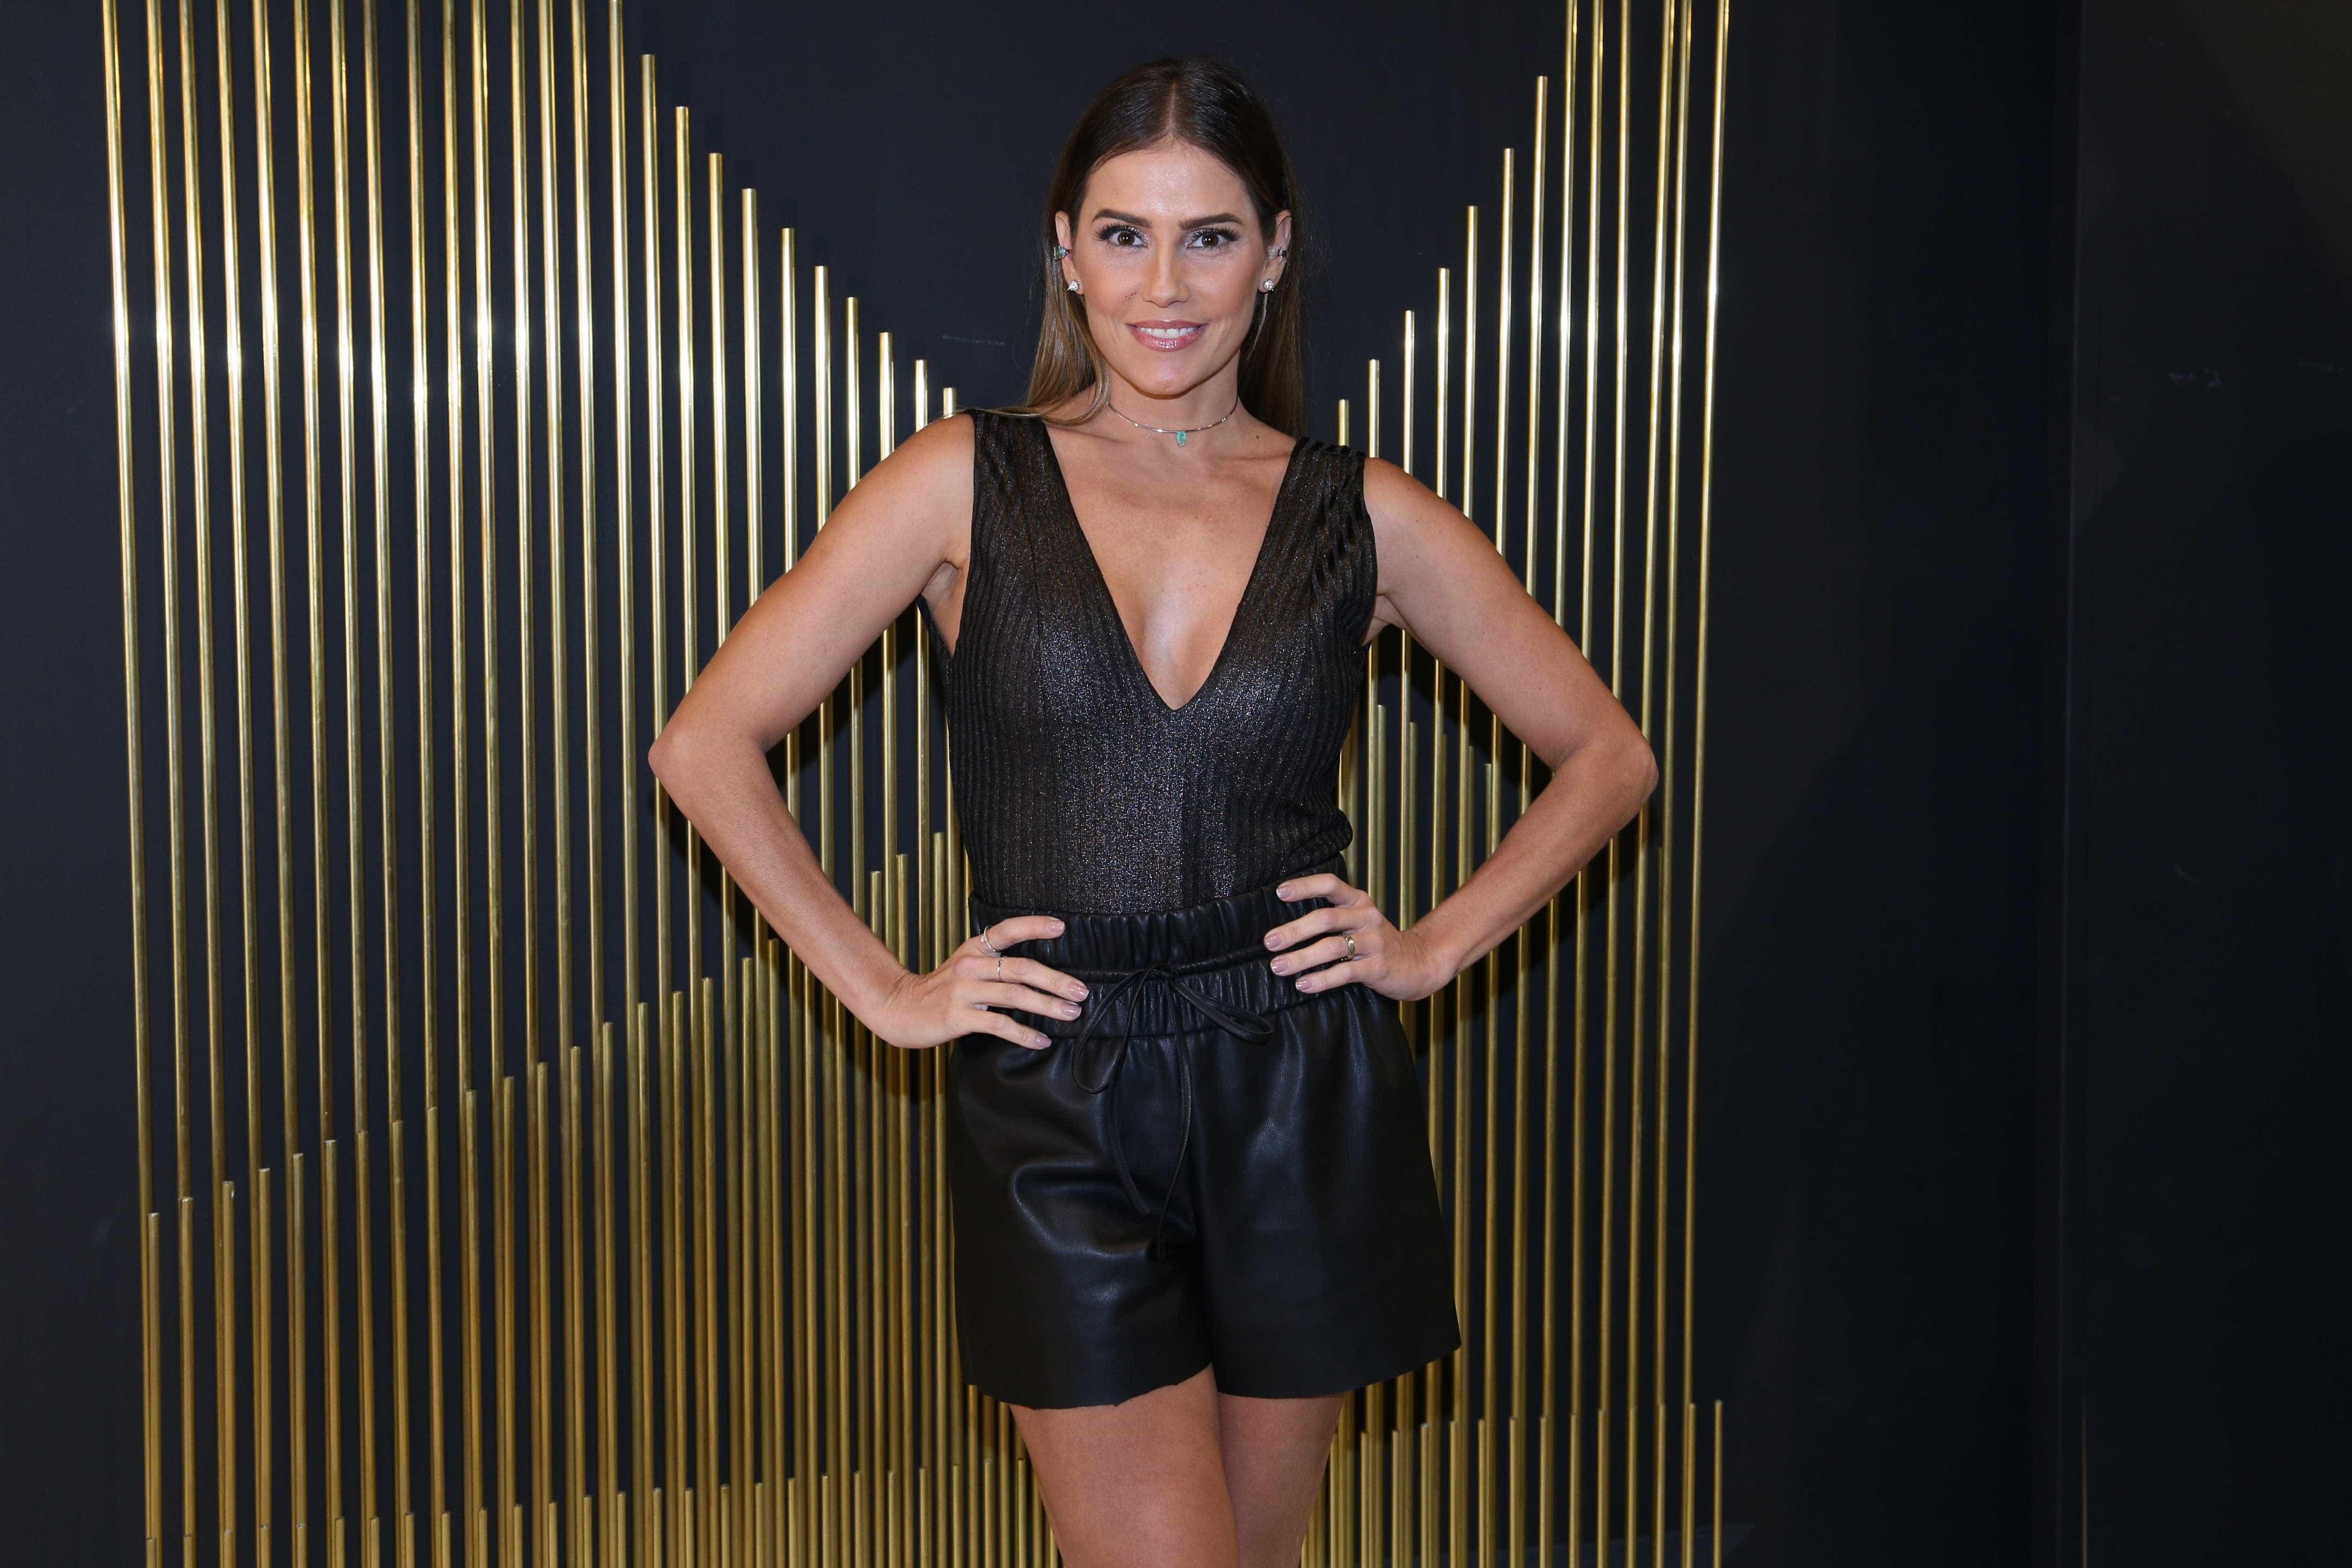 Deborah Secco acaricia barriga de Isis Valverde durante evento de moda